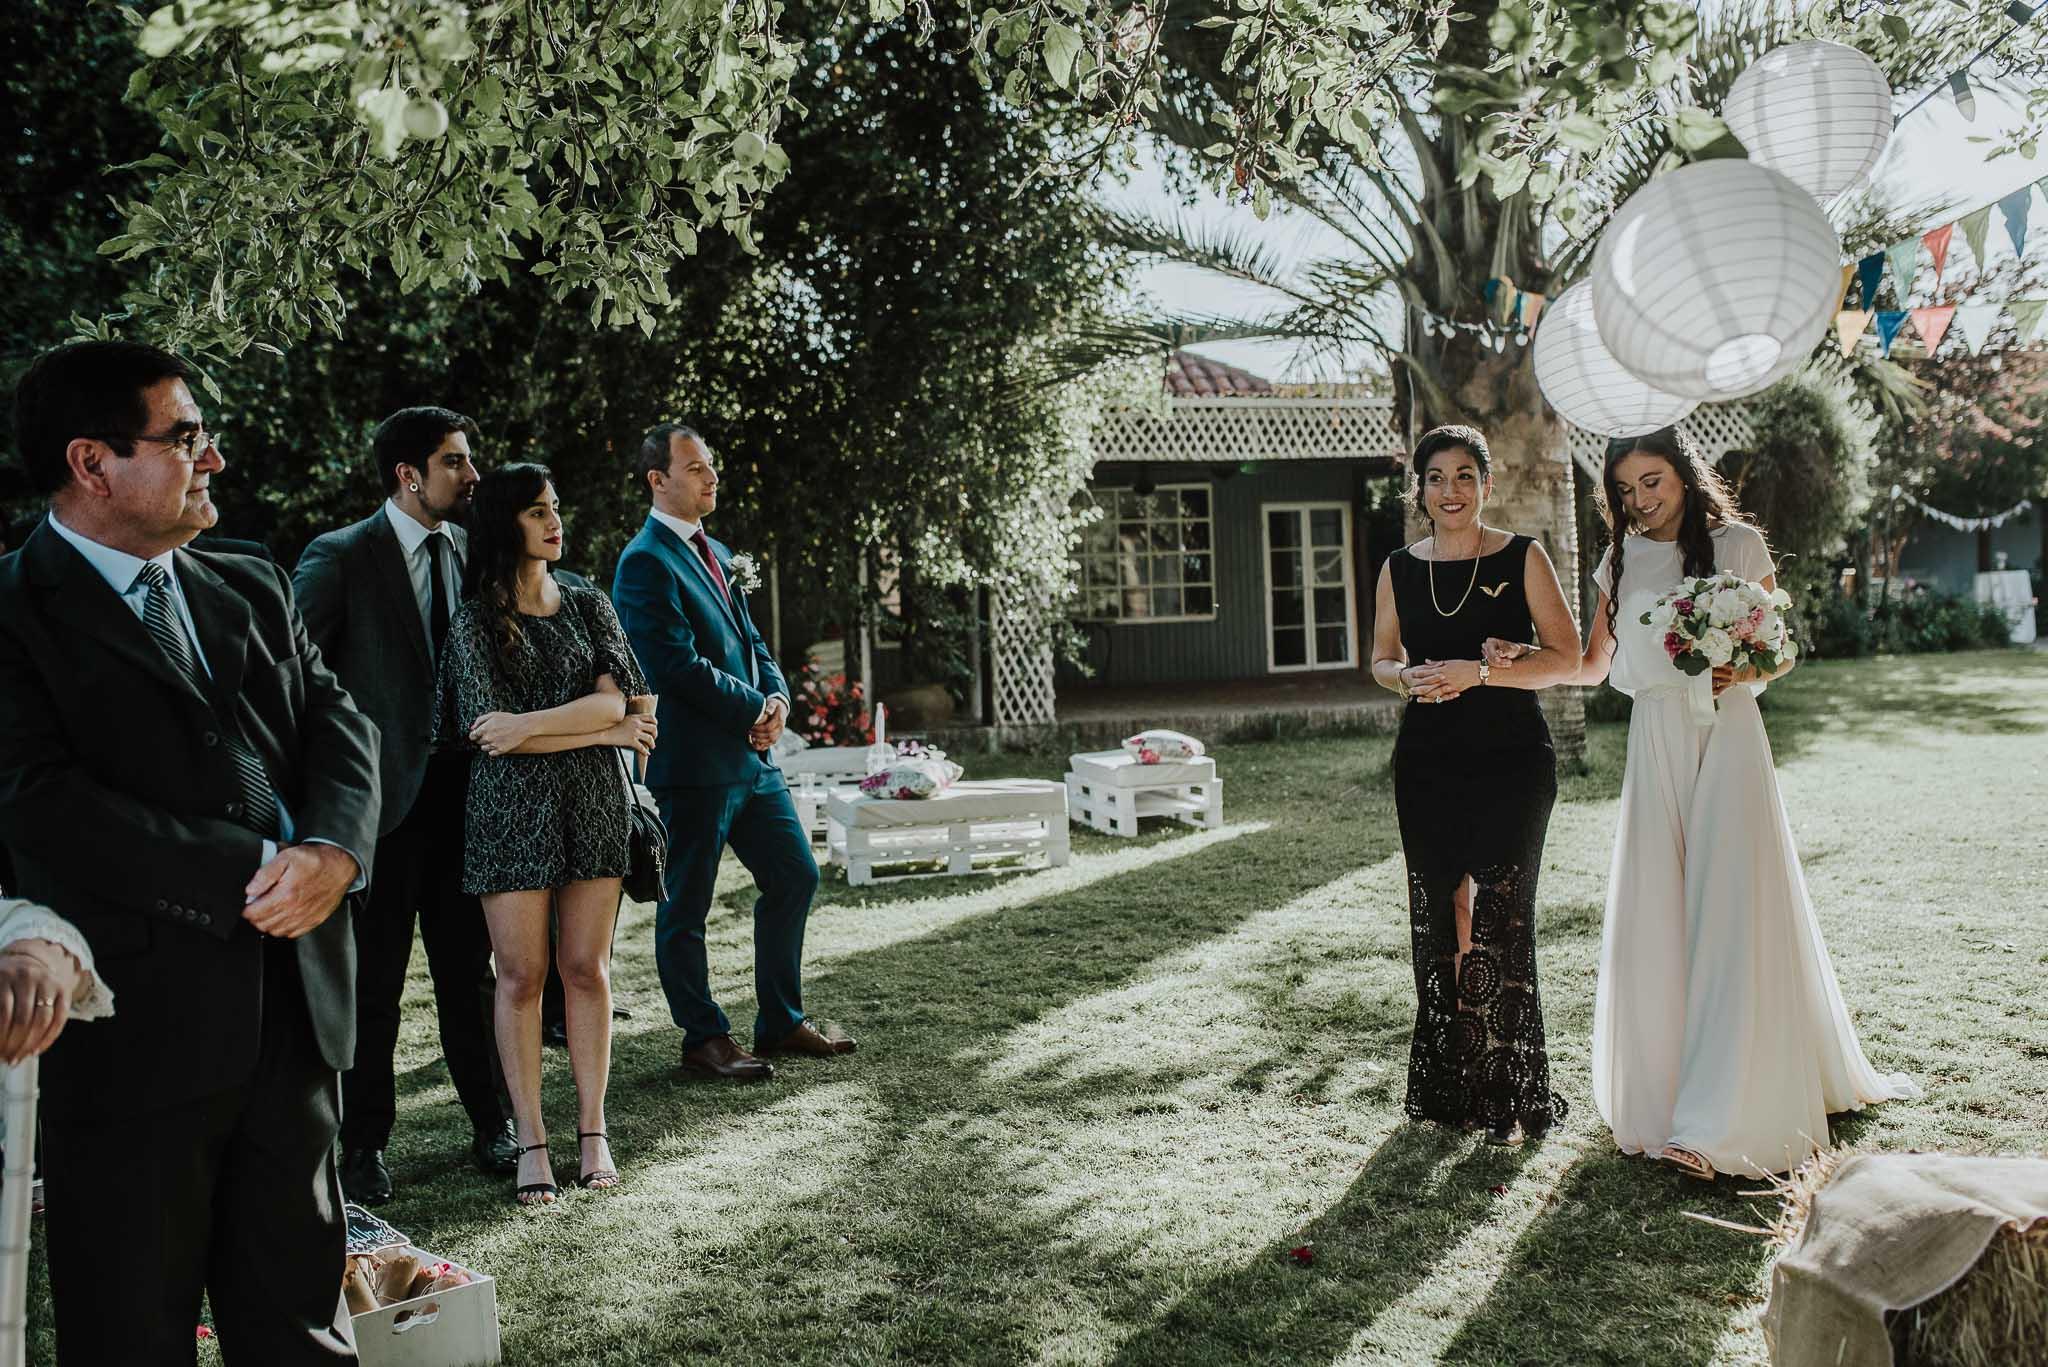 ceremonia-casa de campo fuller-vestido de novia